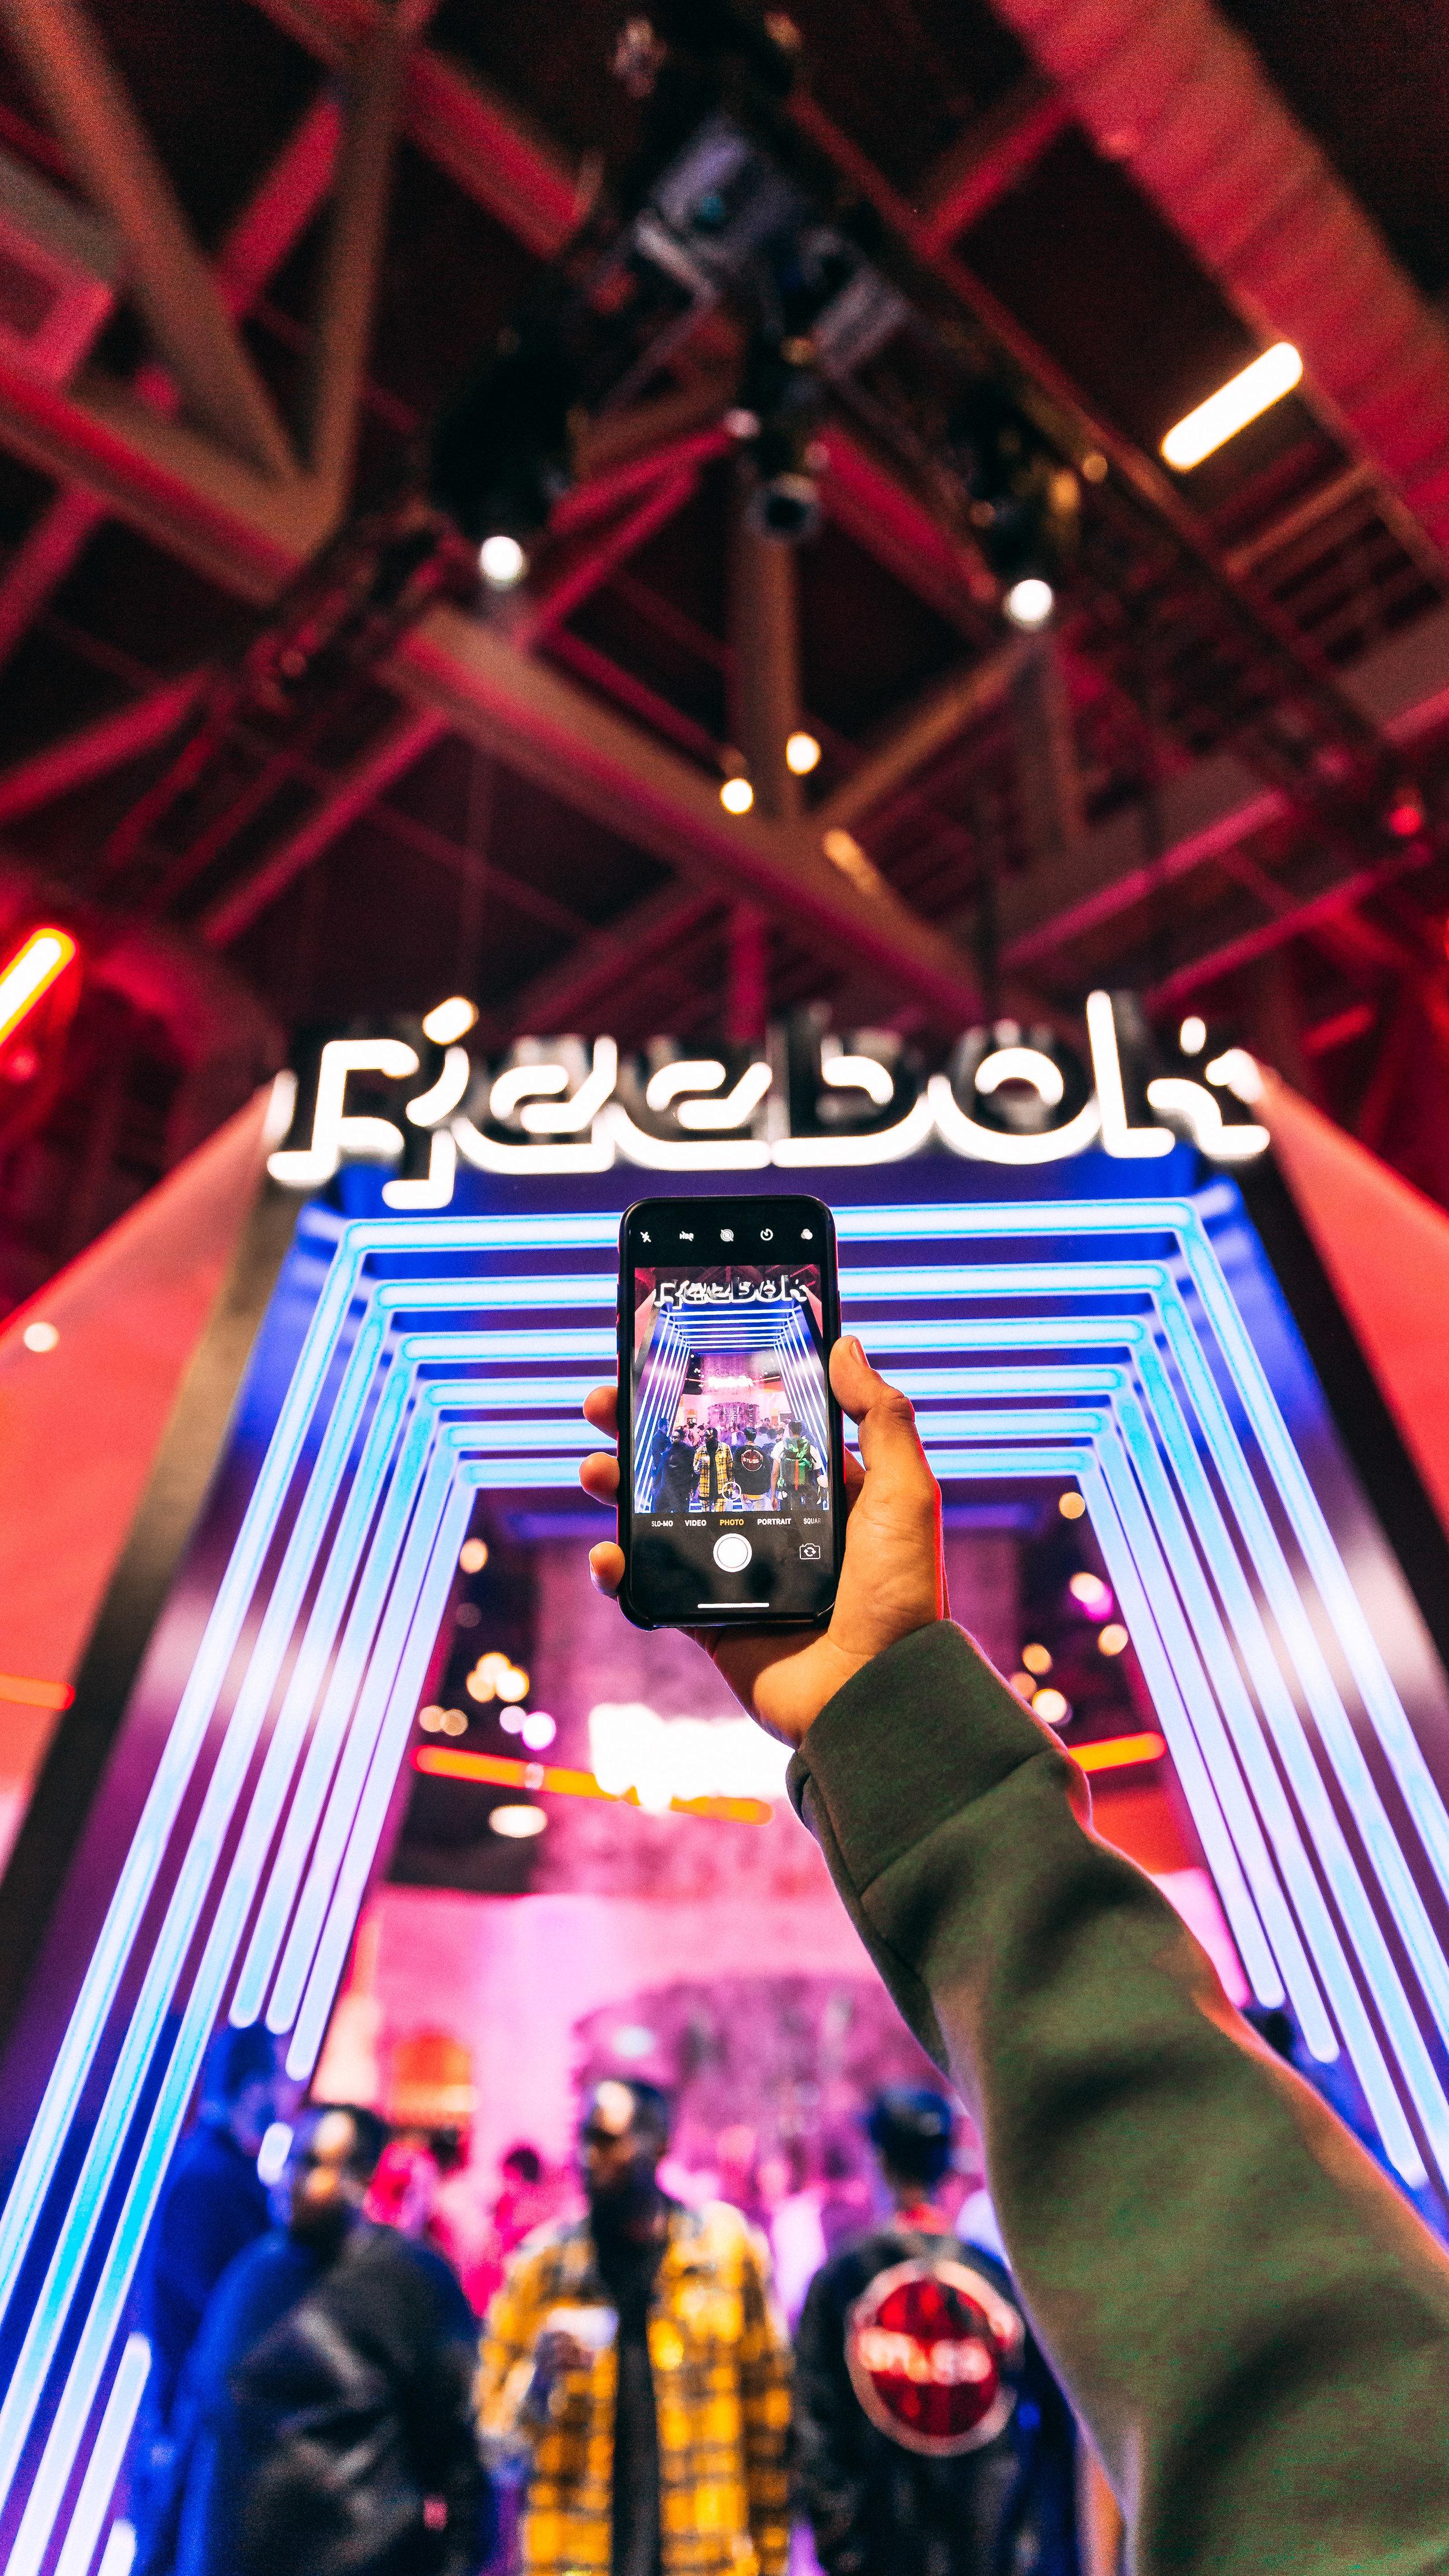 ReebokComplexcon-412.jpg